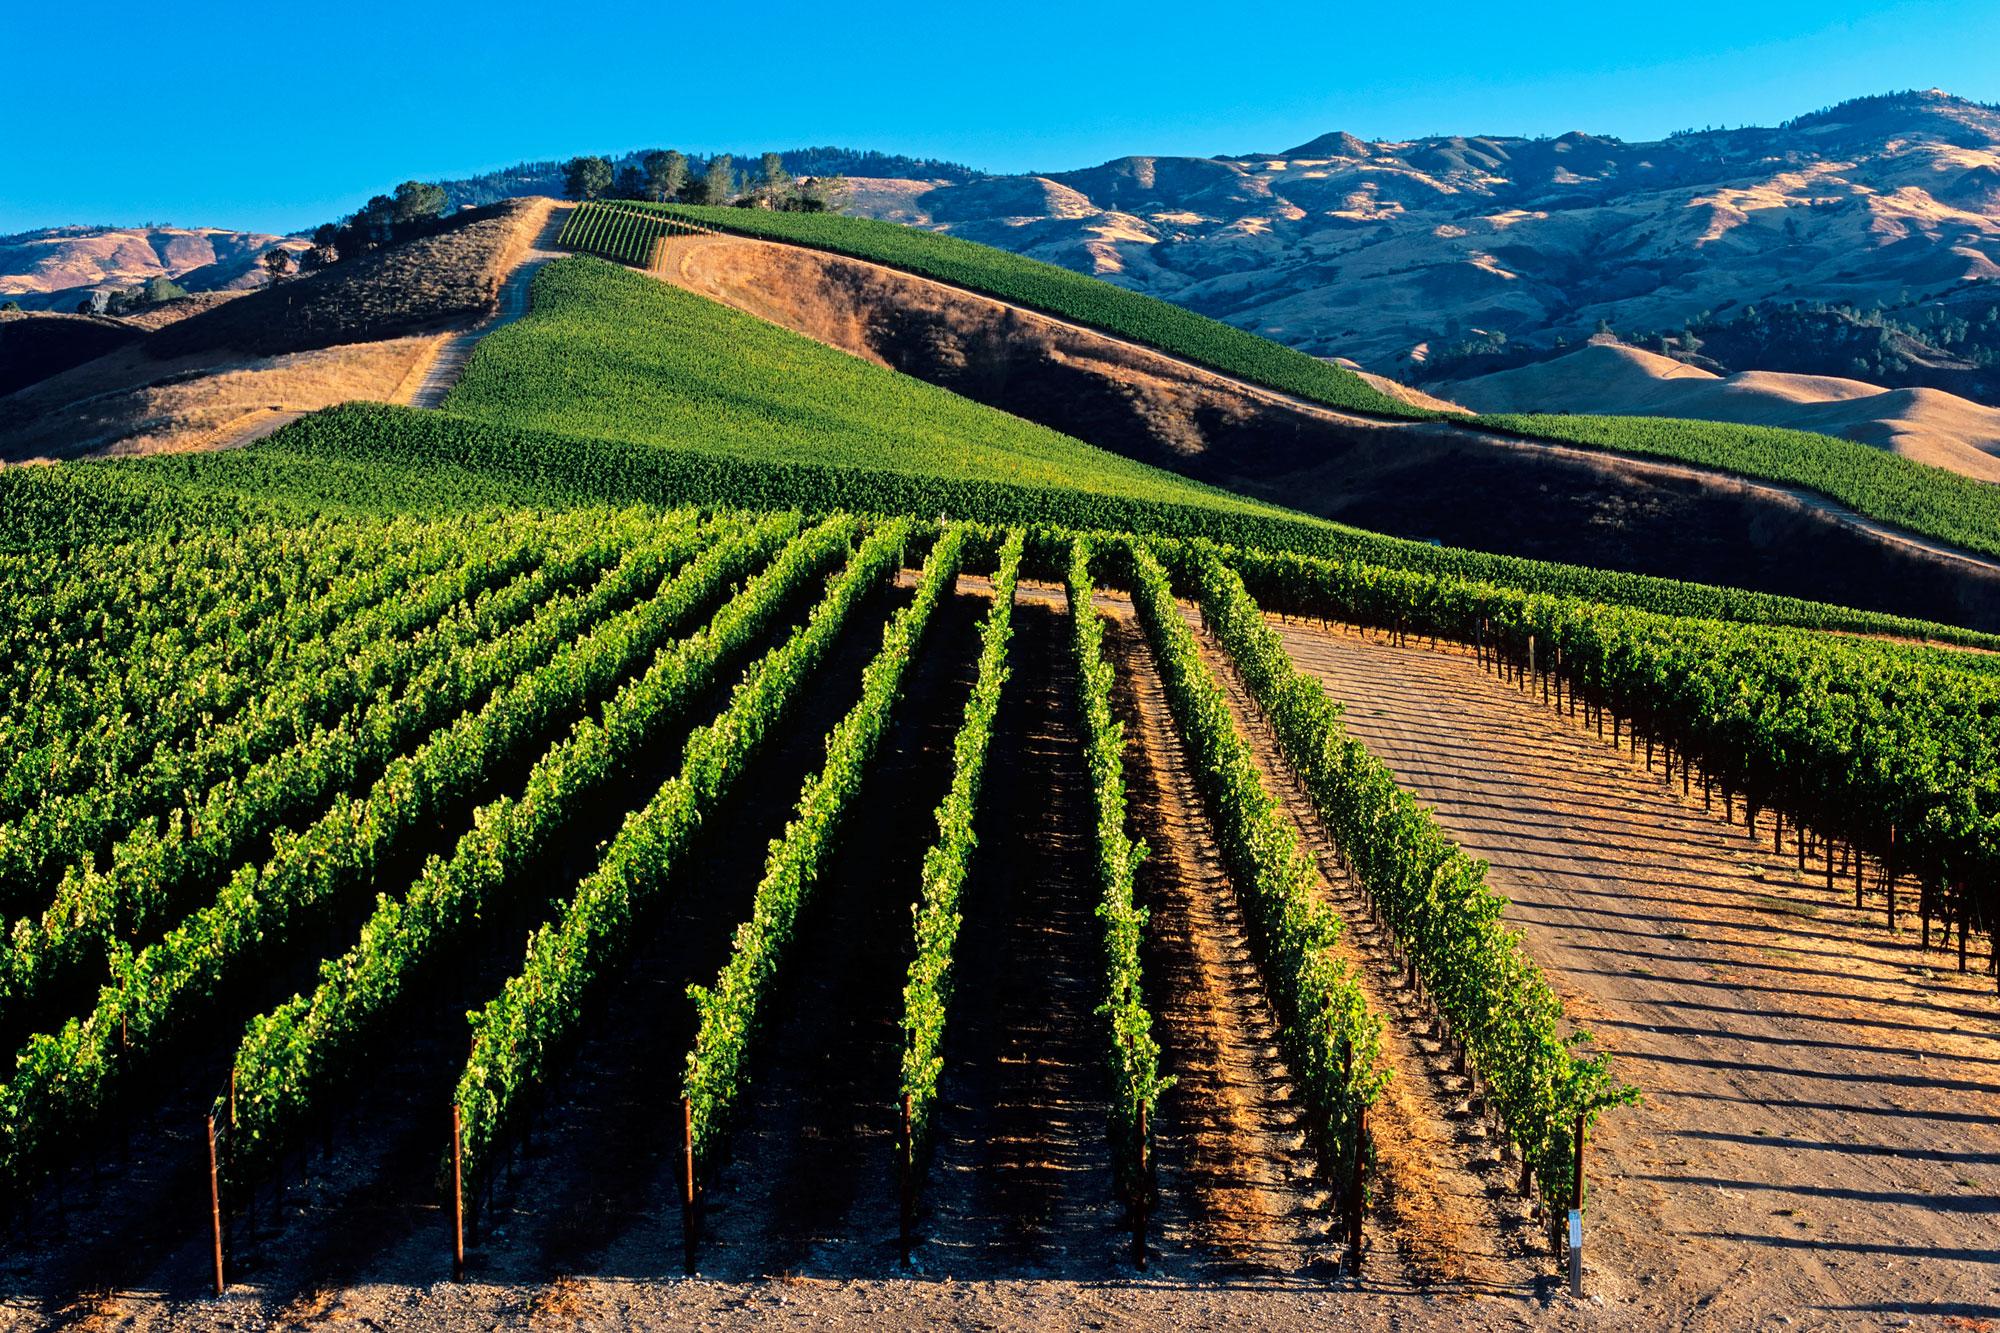 How To Plant A Vineyard - Tn Nursery